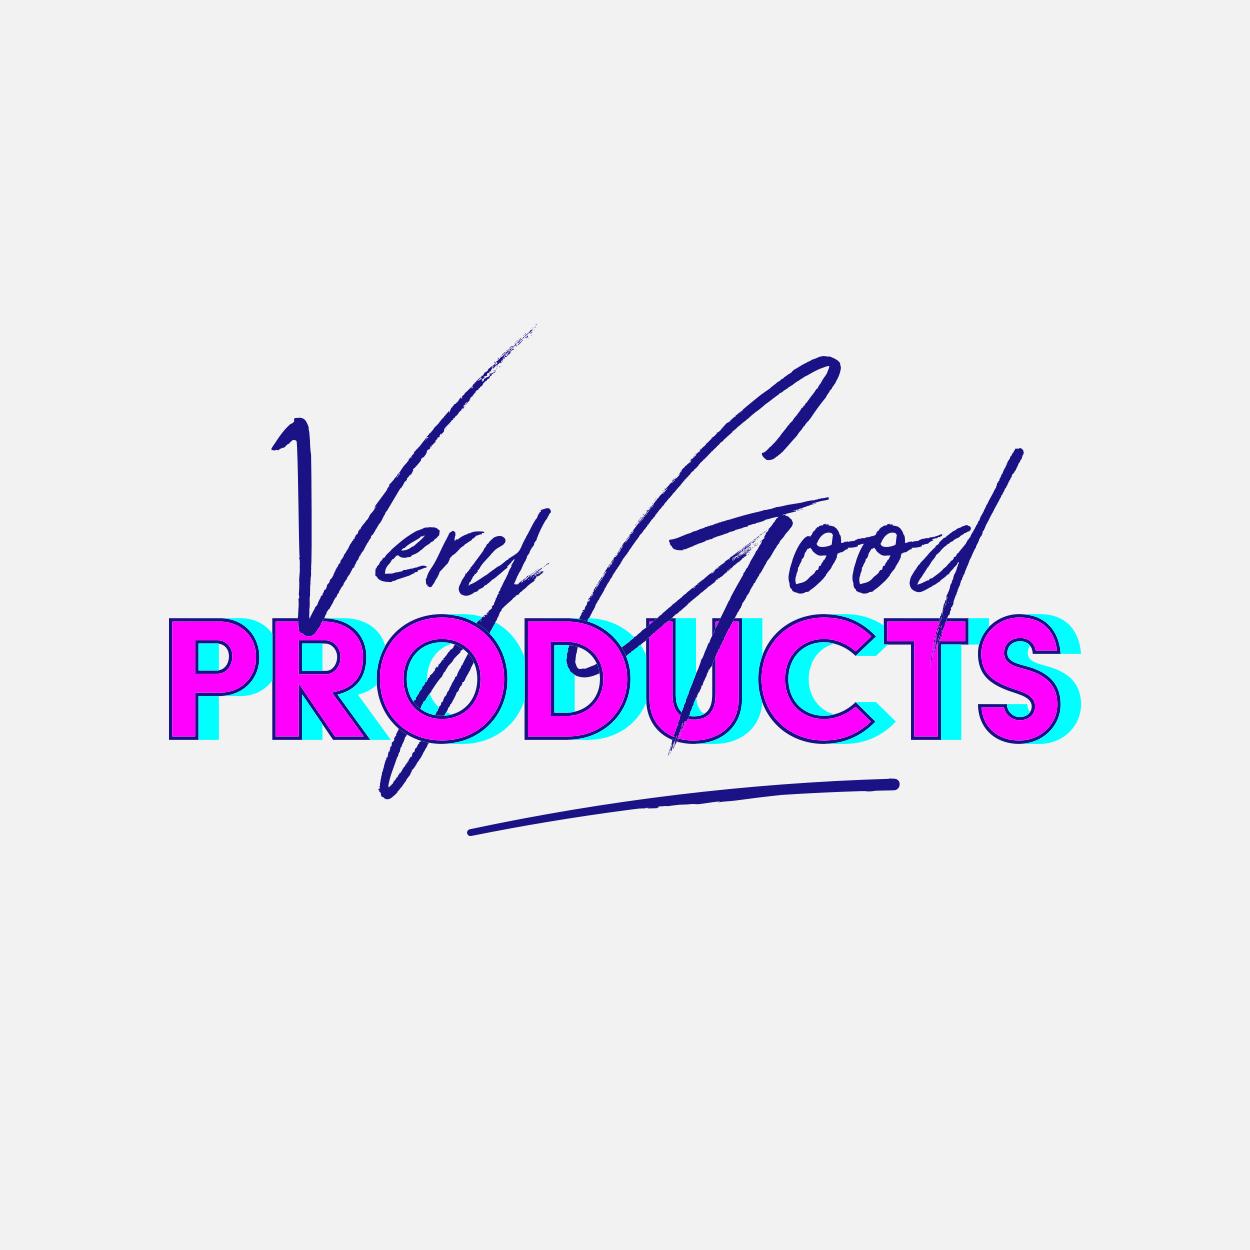 Good Day Club sub brand Very Good Products logo